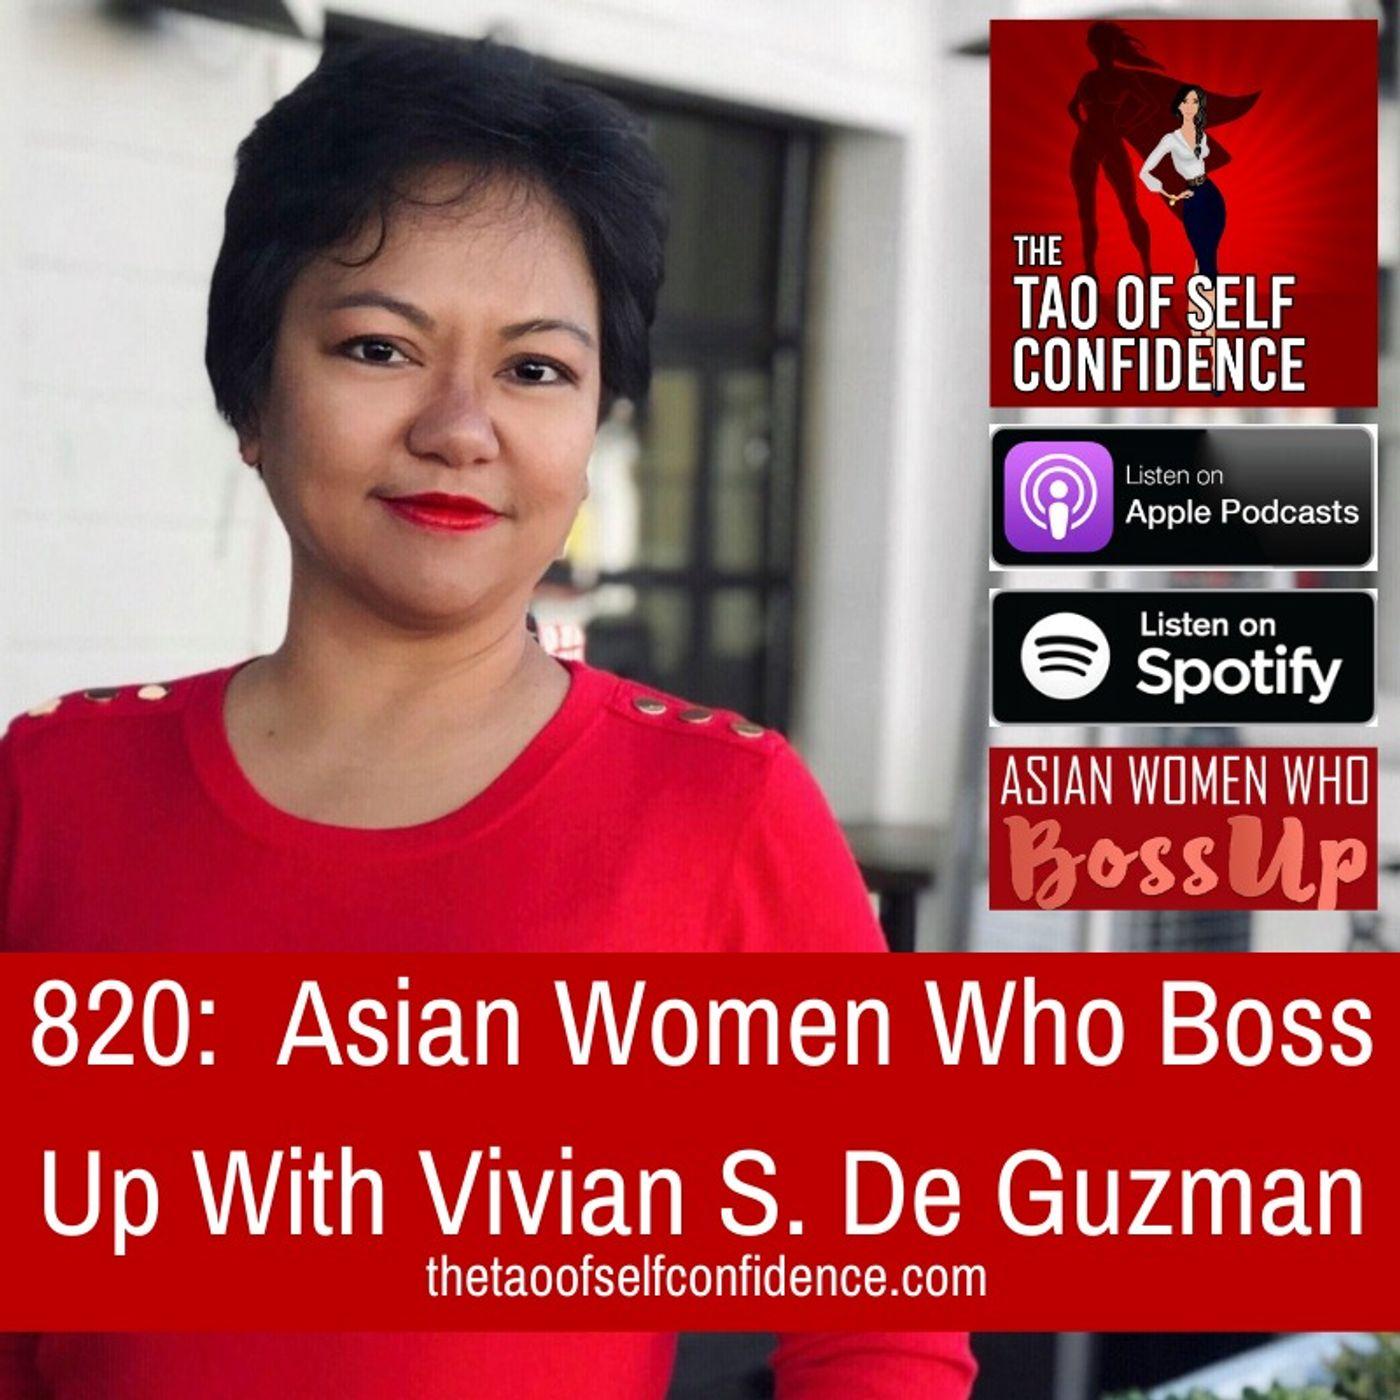 820:  Asian Women Who Boss Up With Vivian S. De Guzman